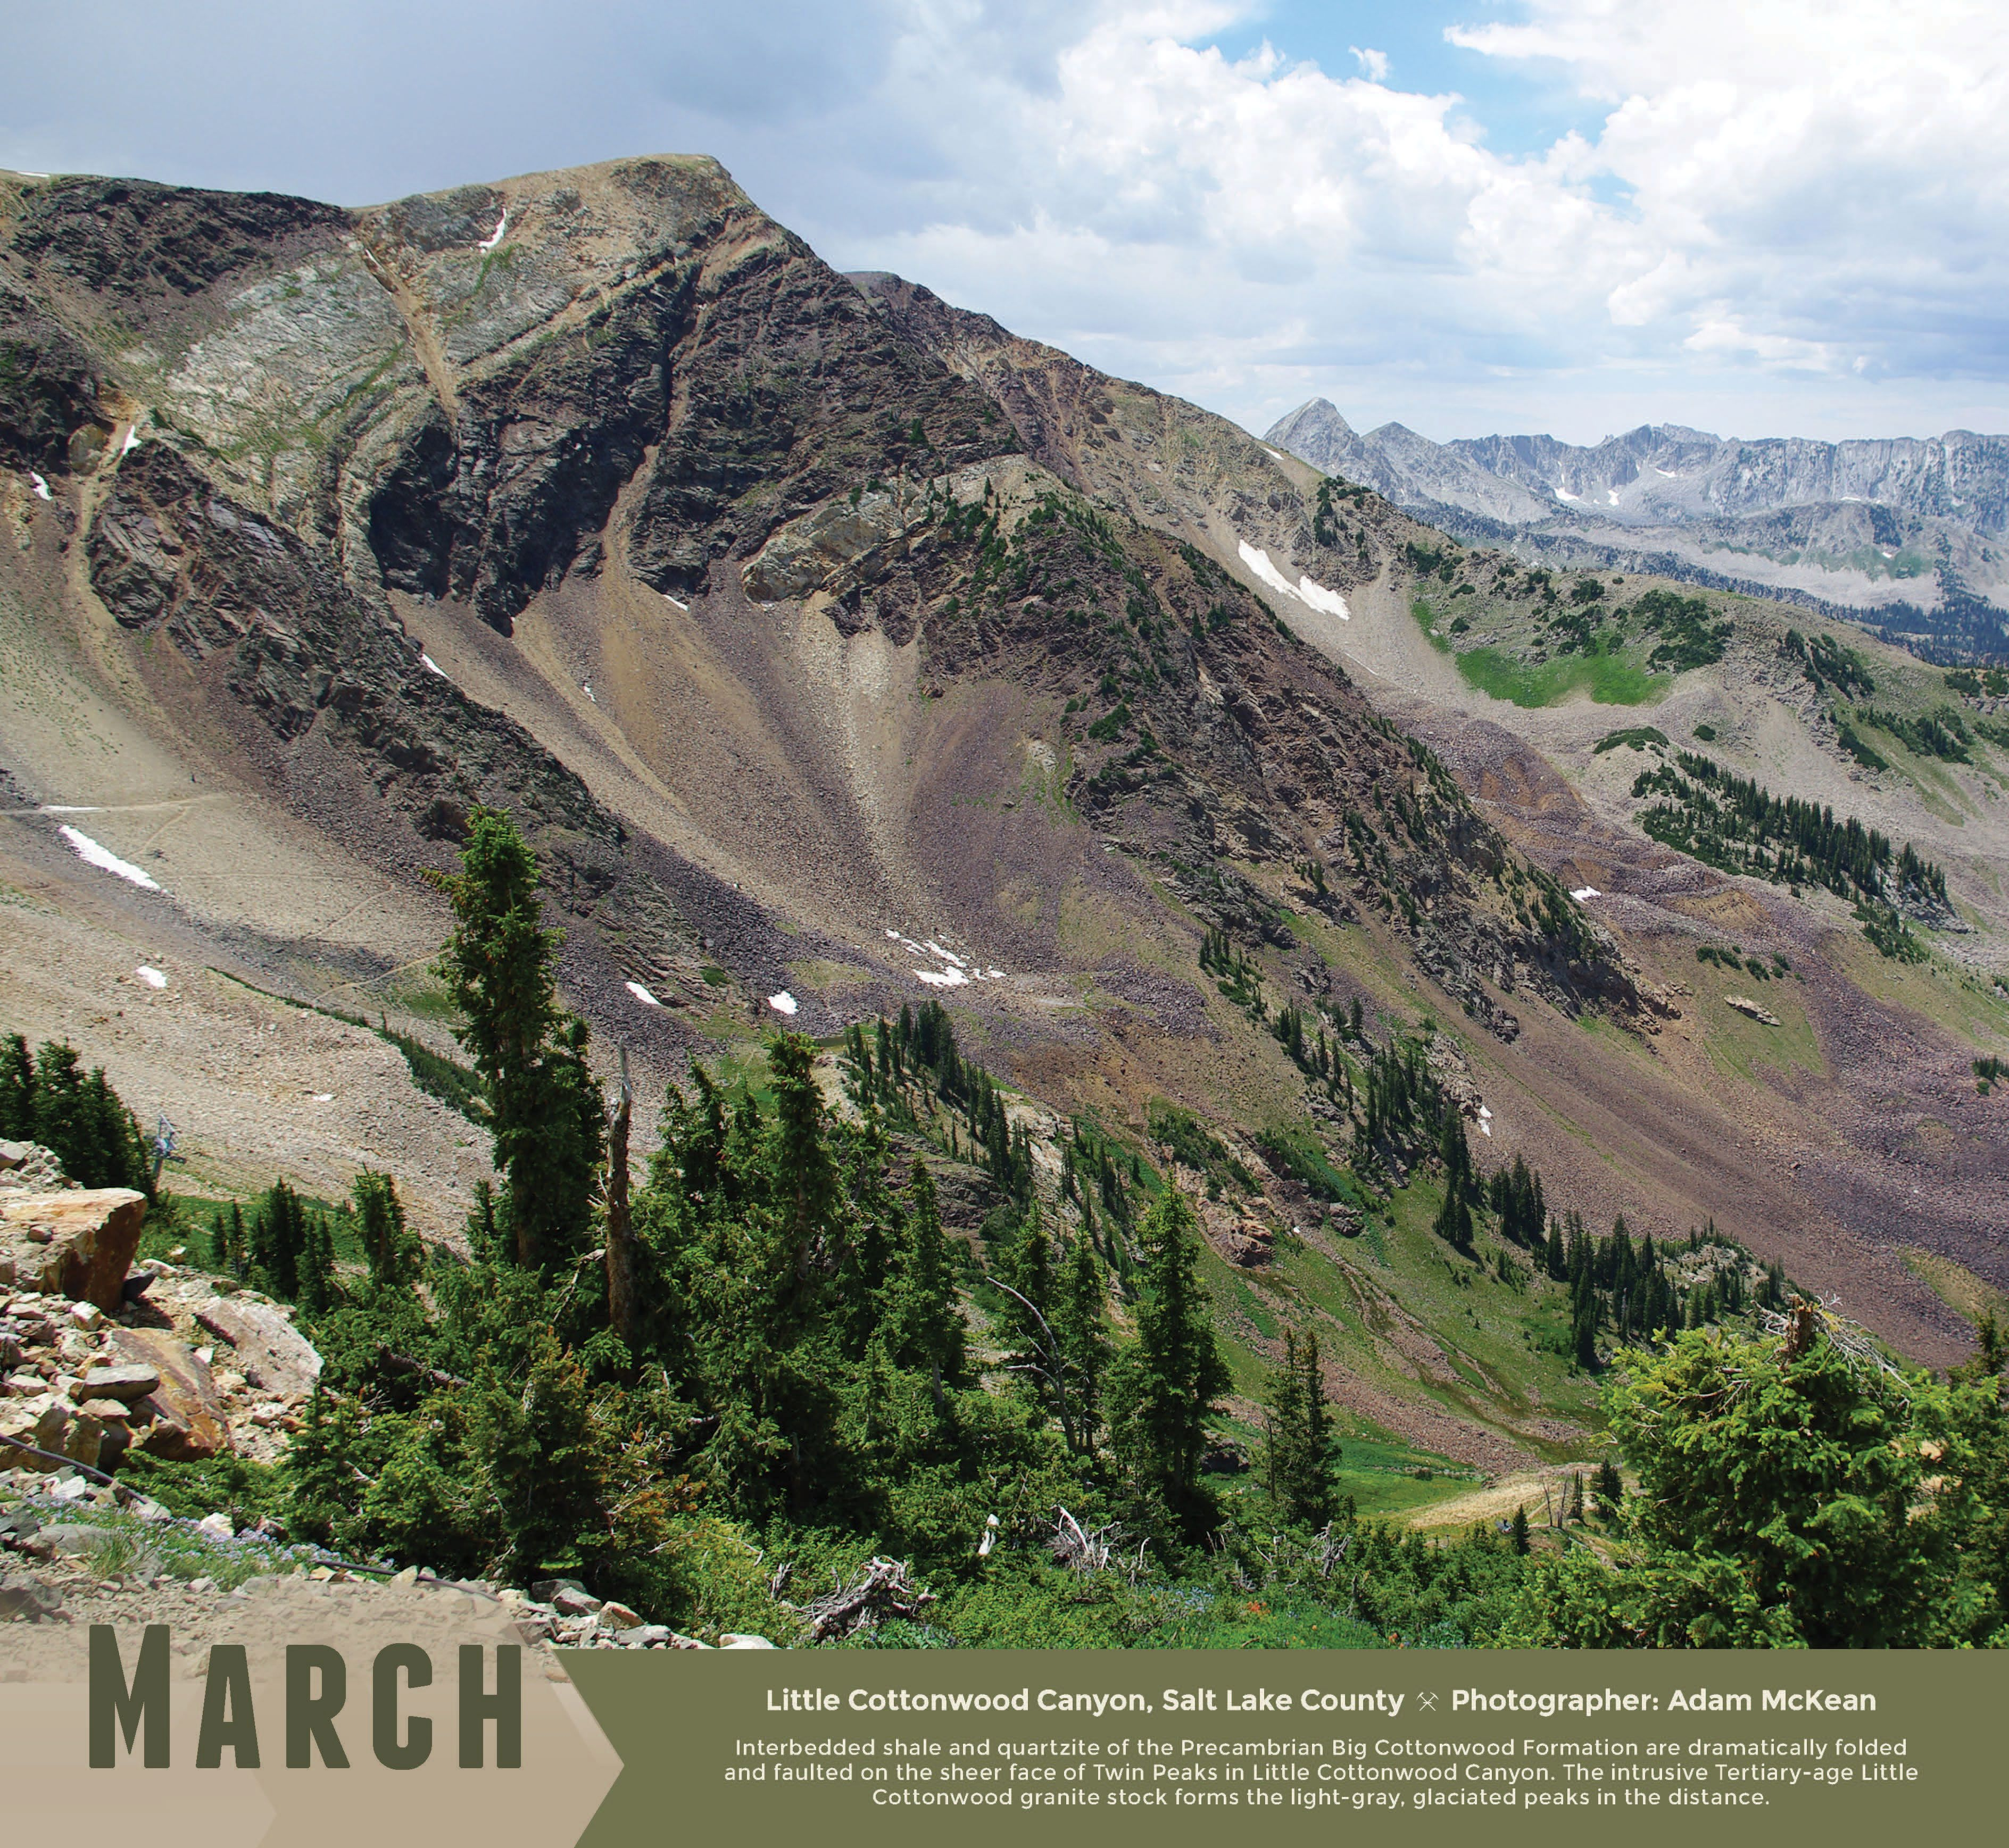 Little Cottonwood Canyon, Salt Lake County Photographer